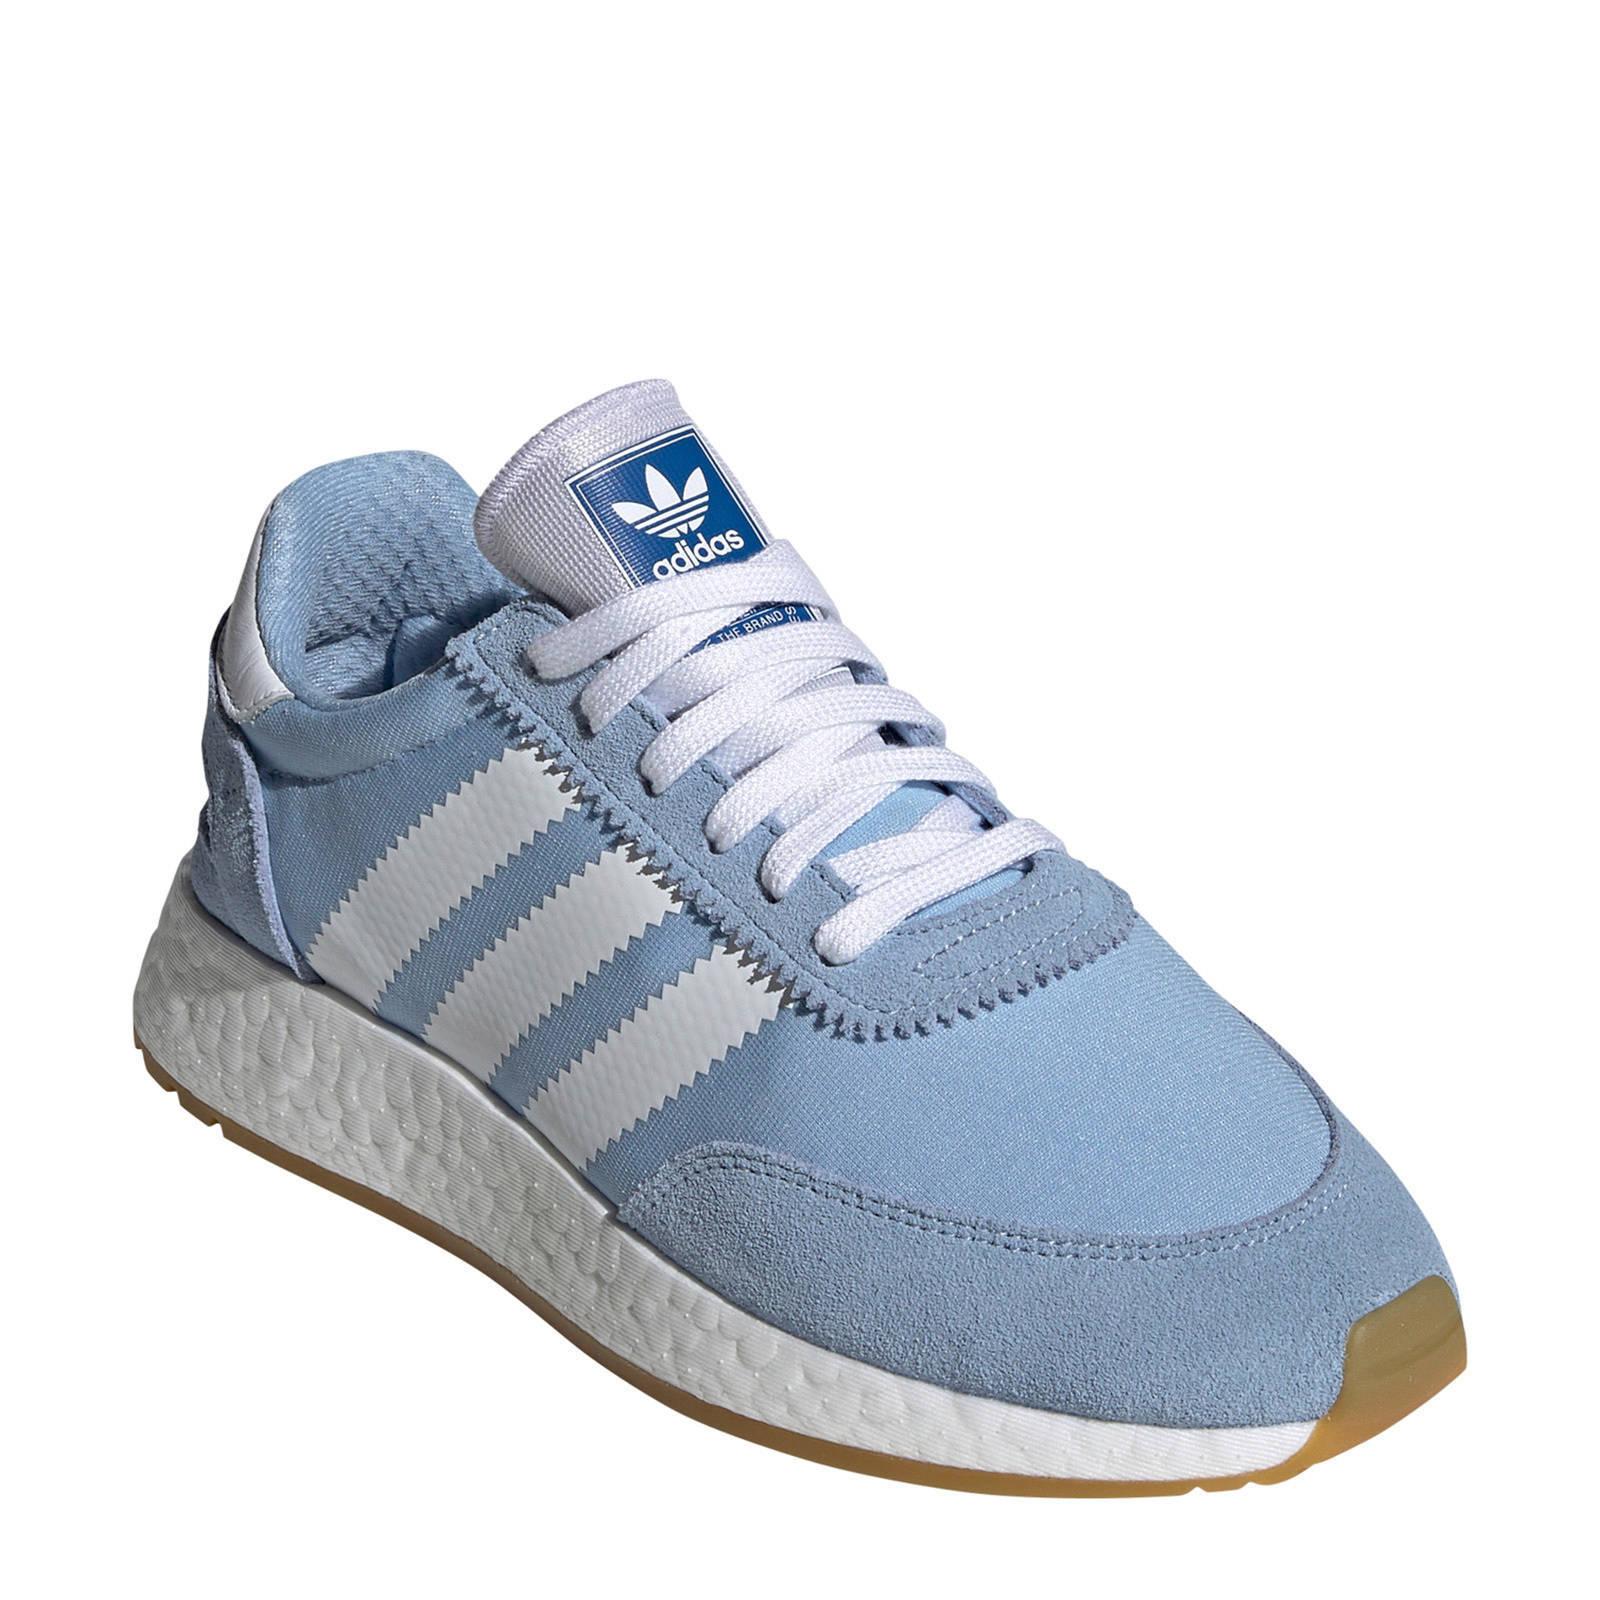 adidas Originals I-5923 W sneakers lichtblauw | wehkamp